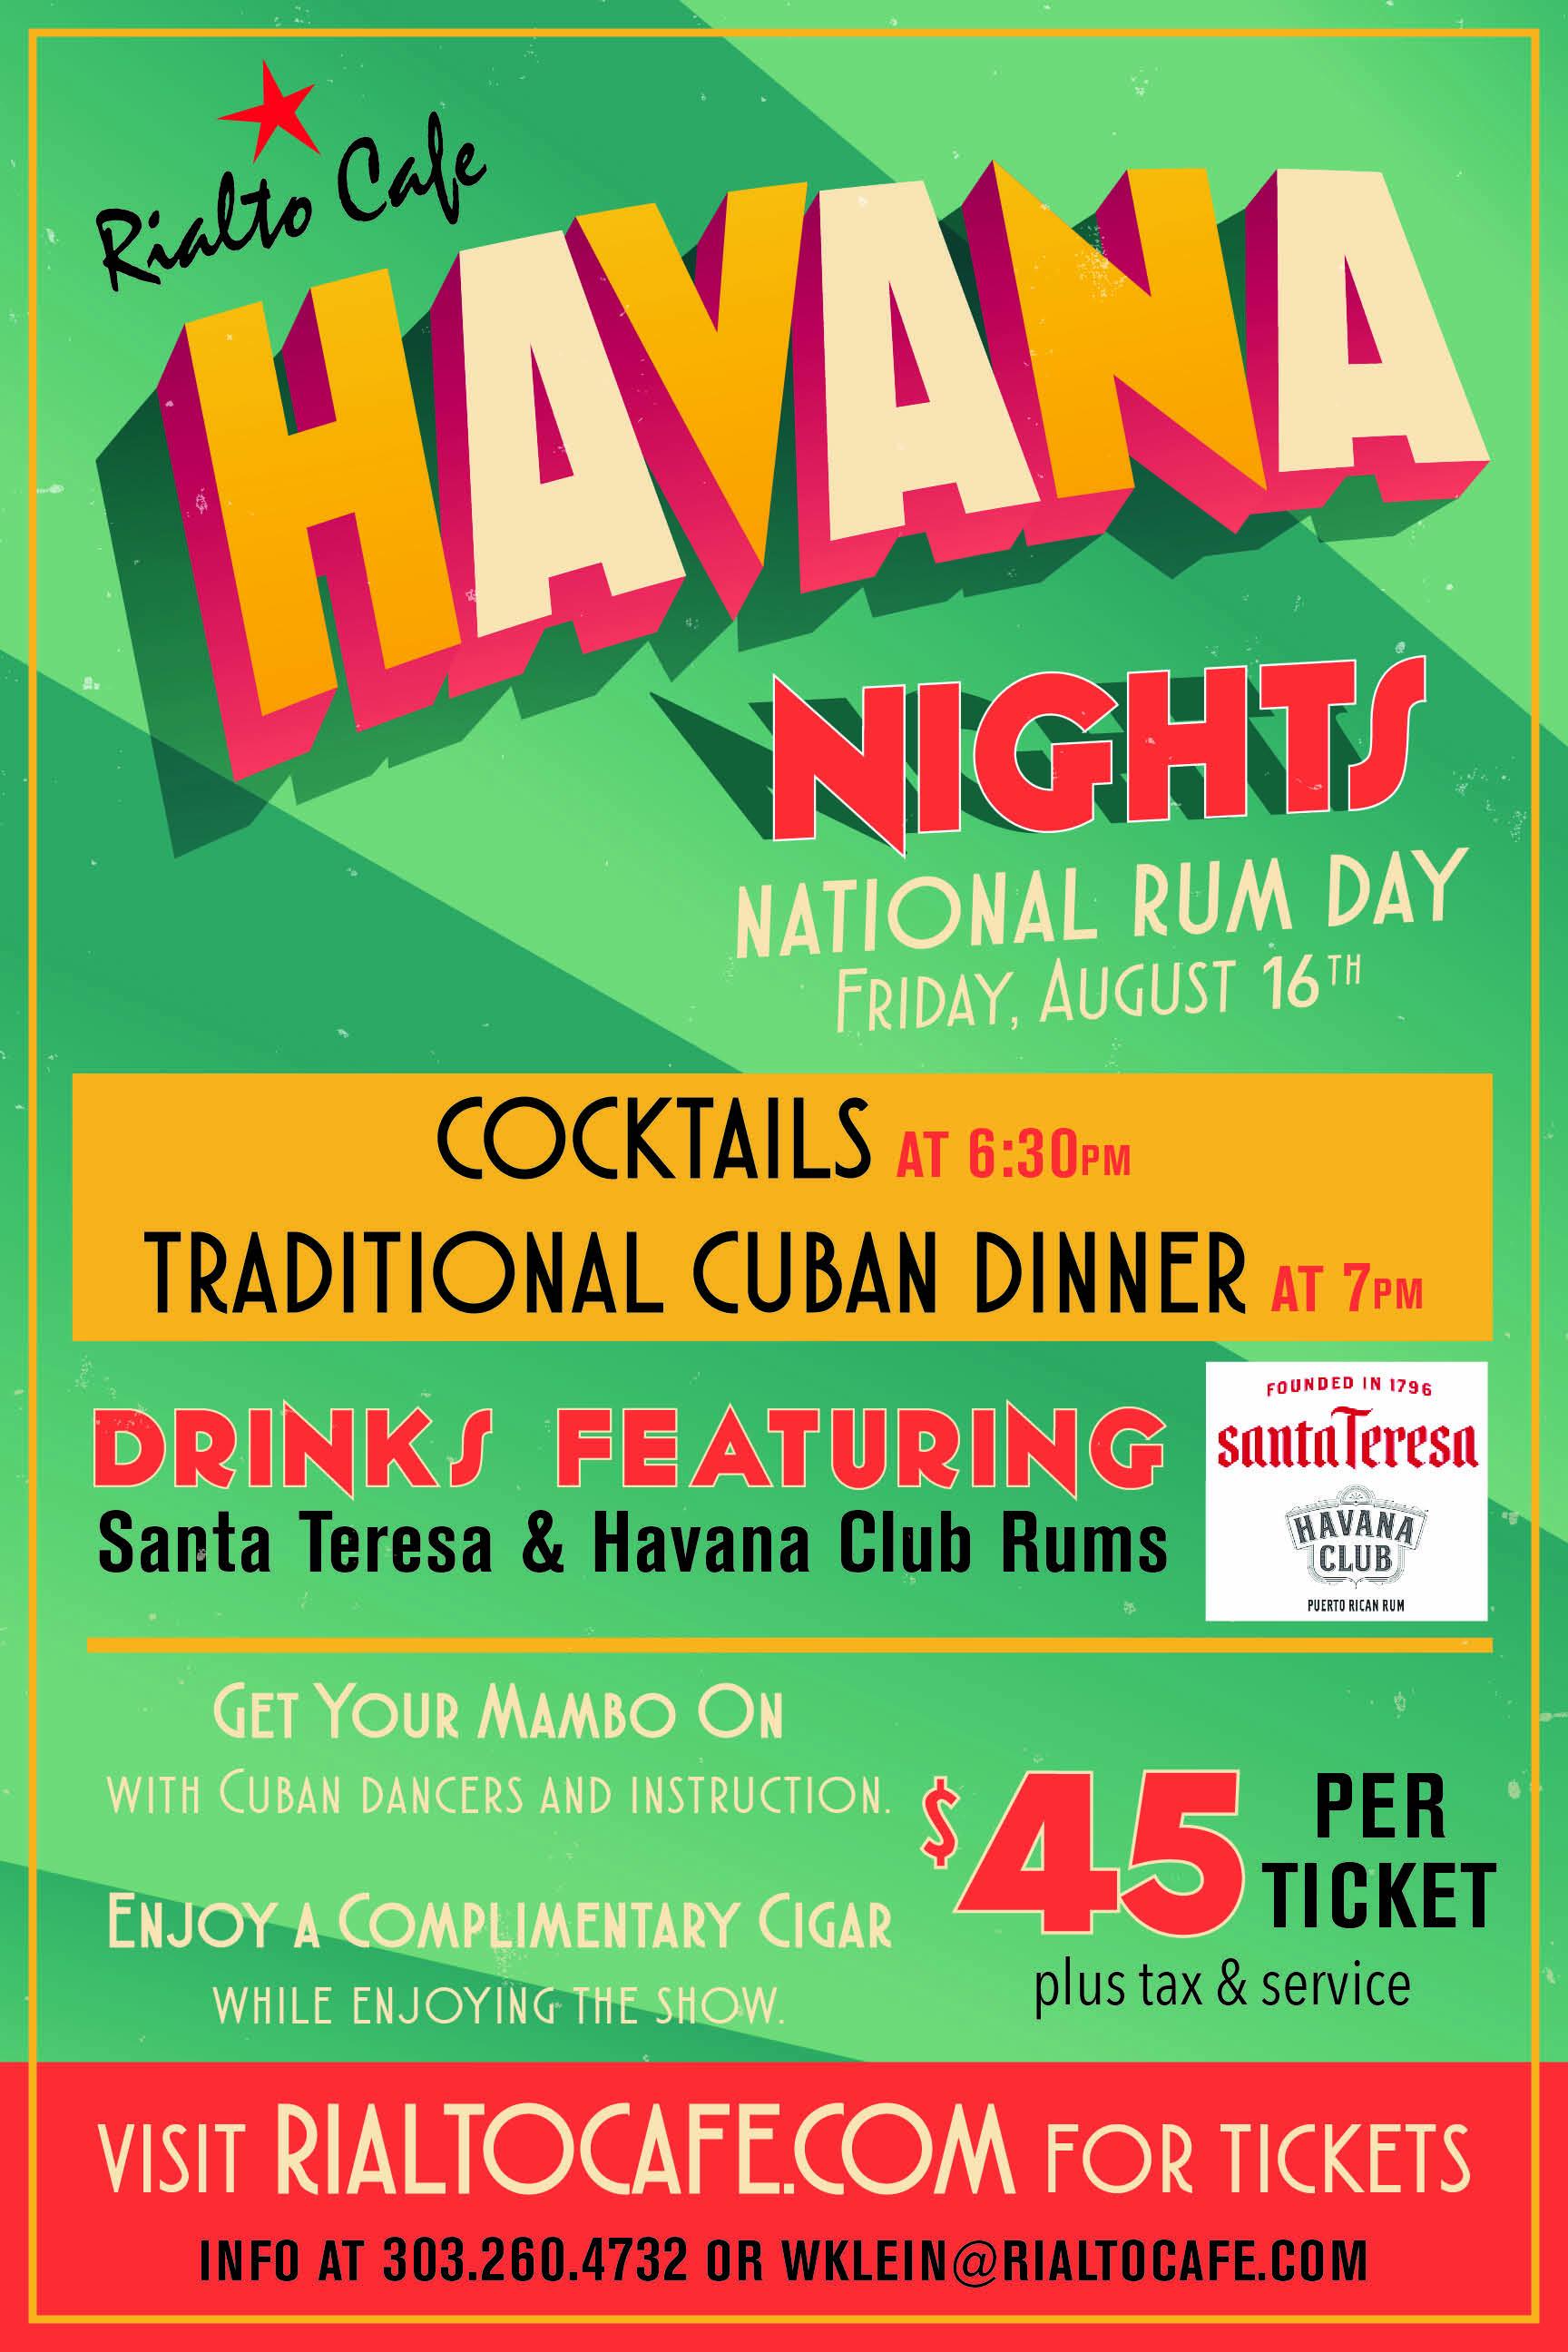 HavanaNights2019_Poster_24x36.jpg